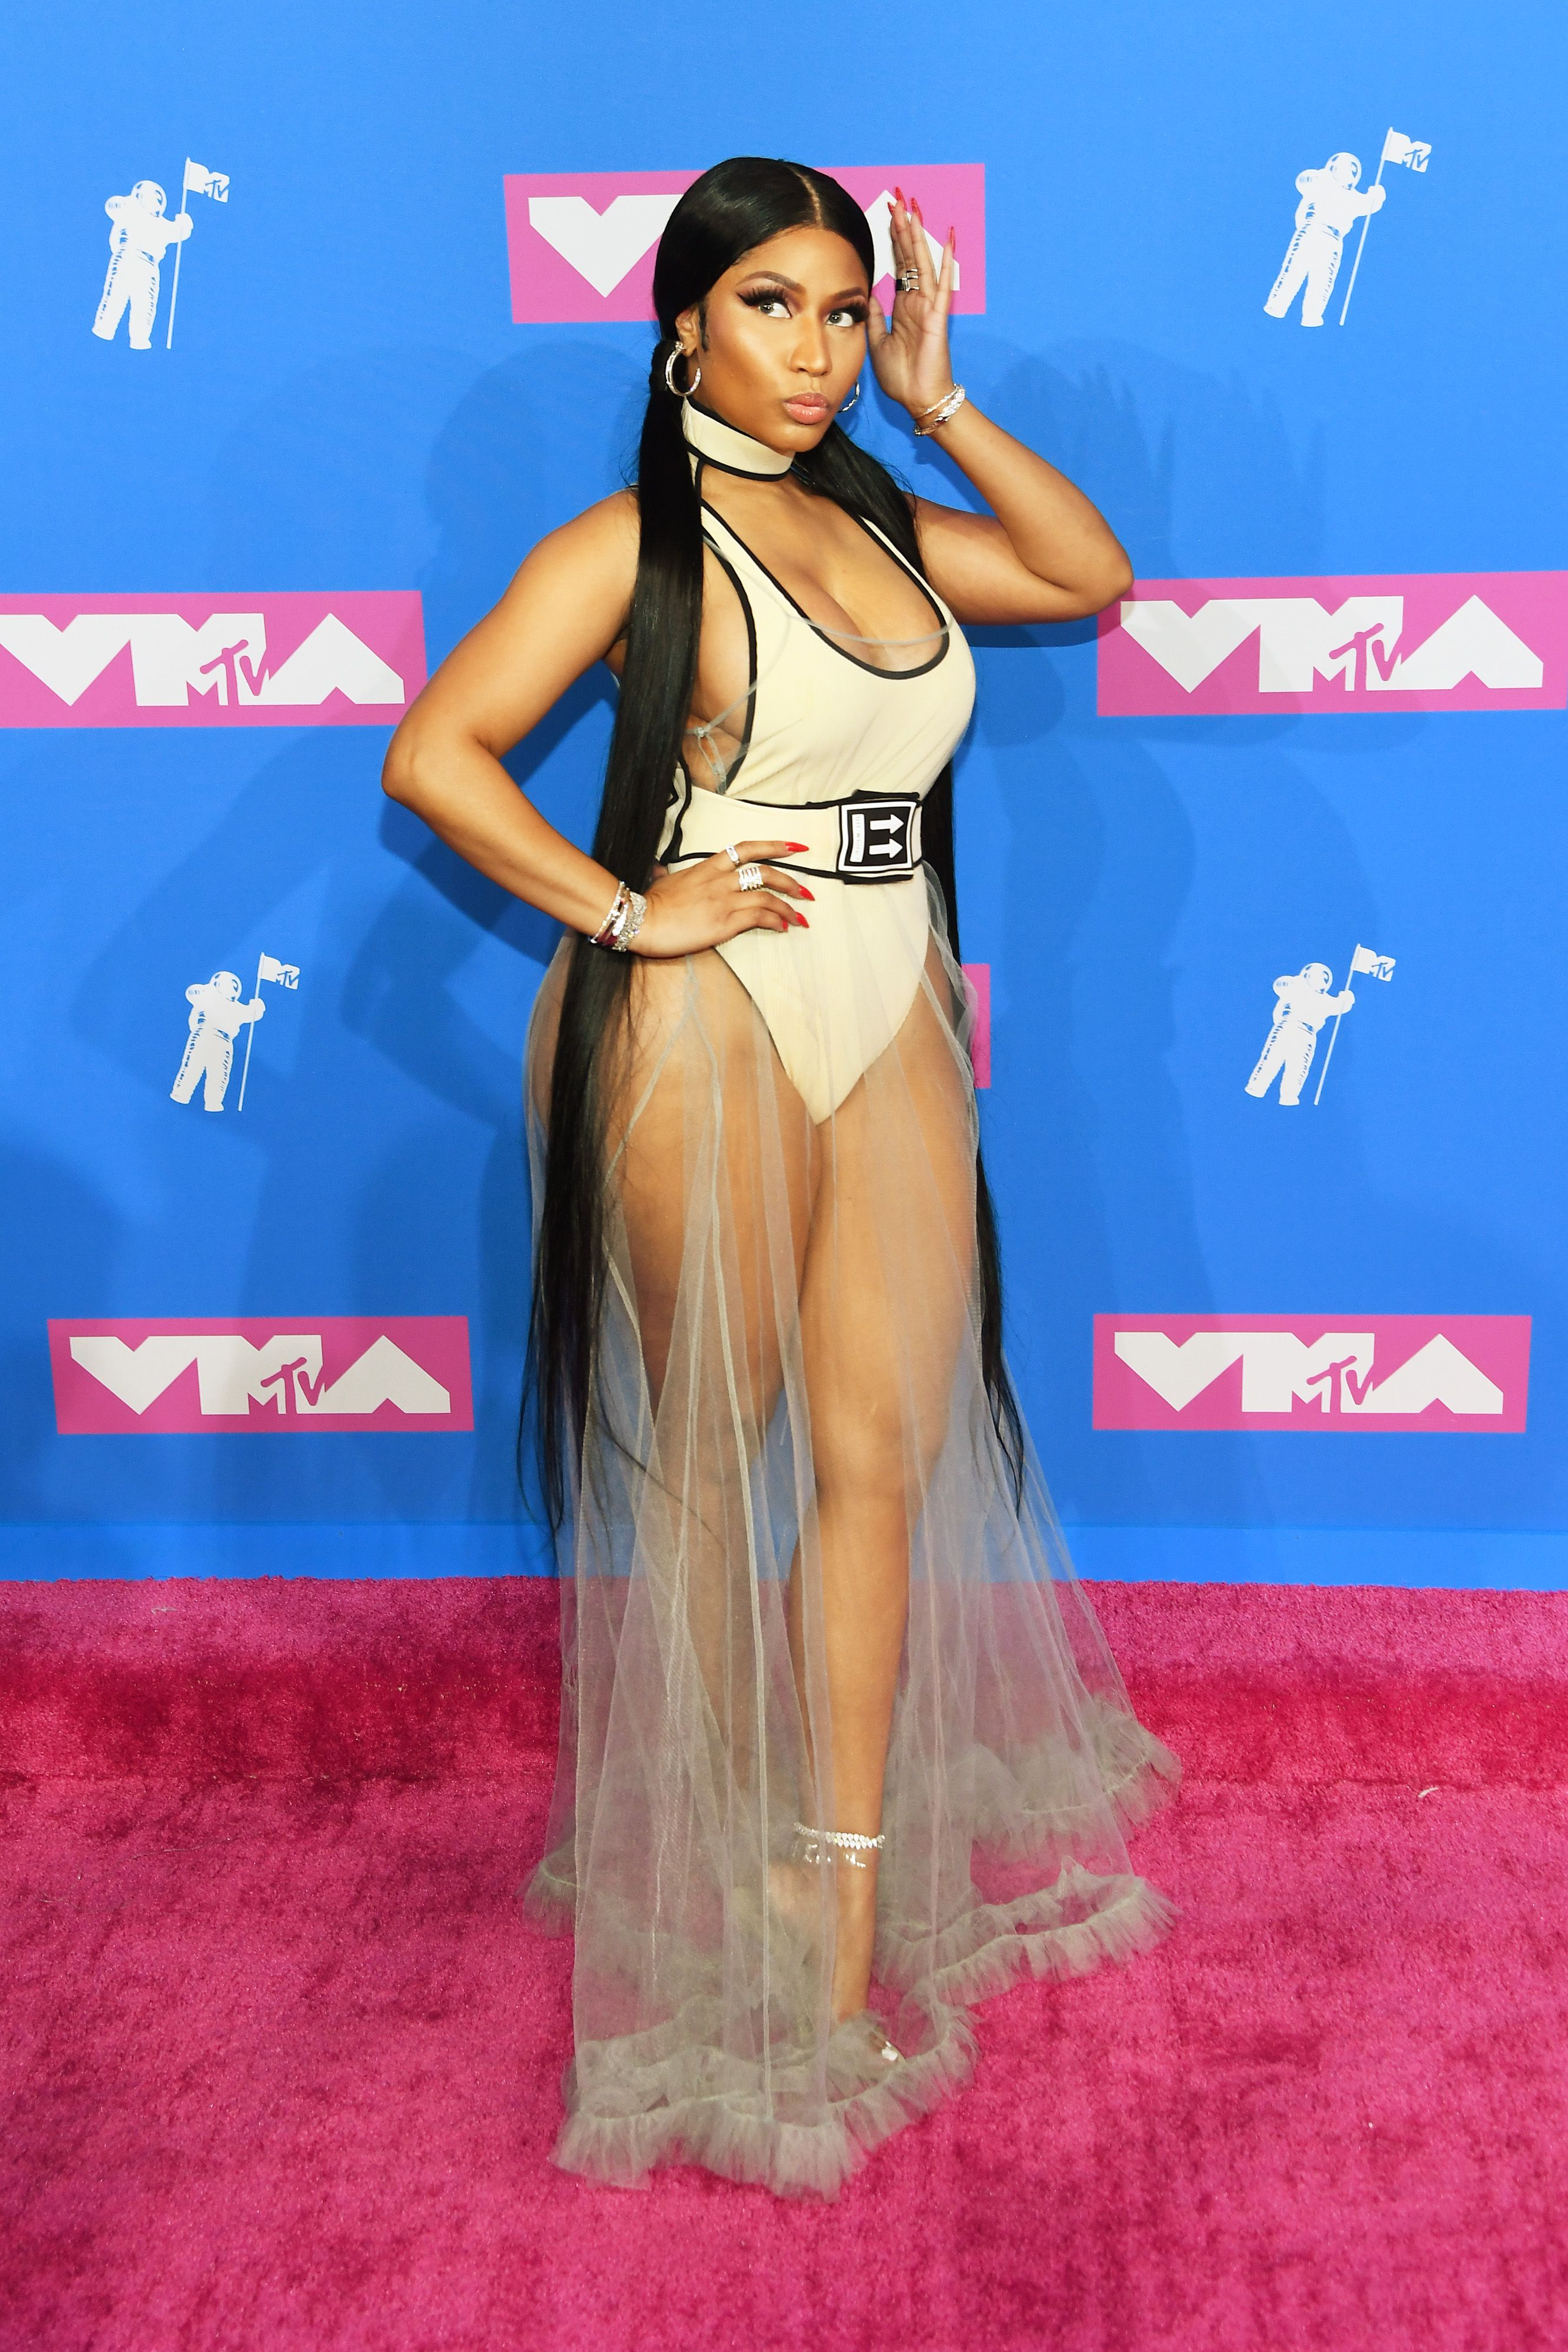 2019 year for women- Minaj Nicki vma pictures